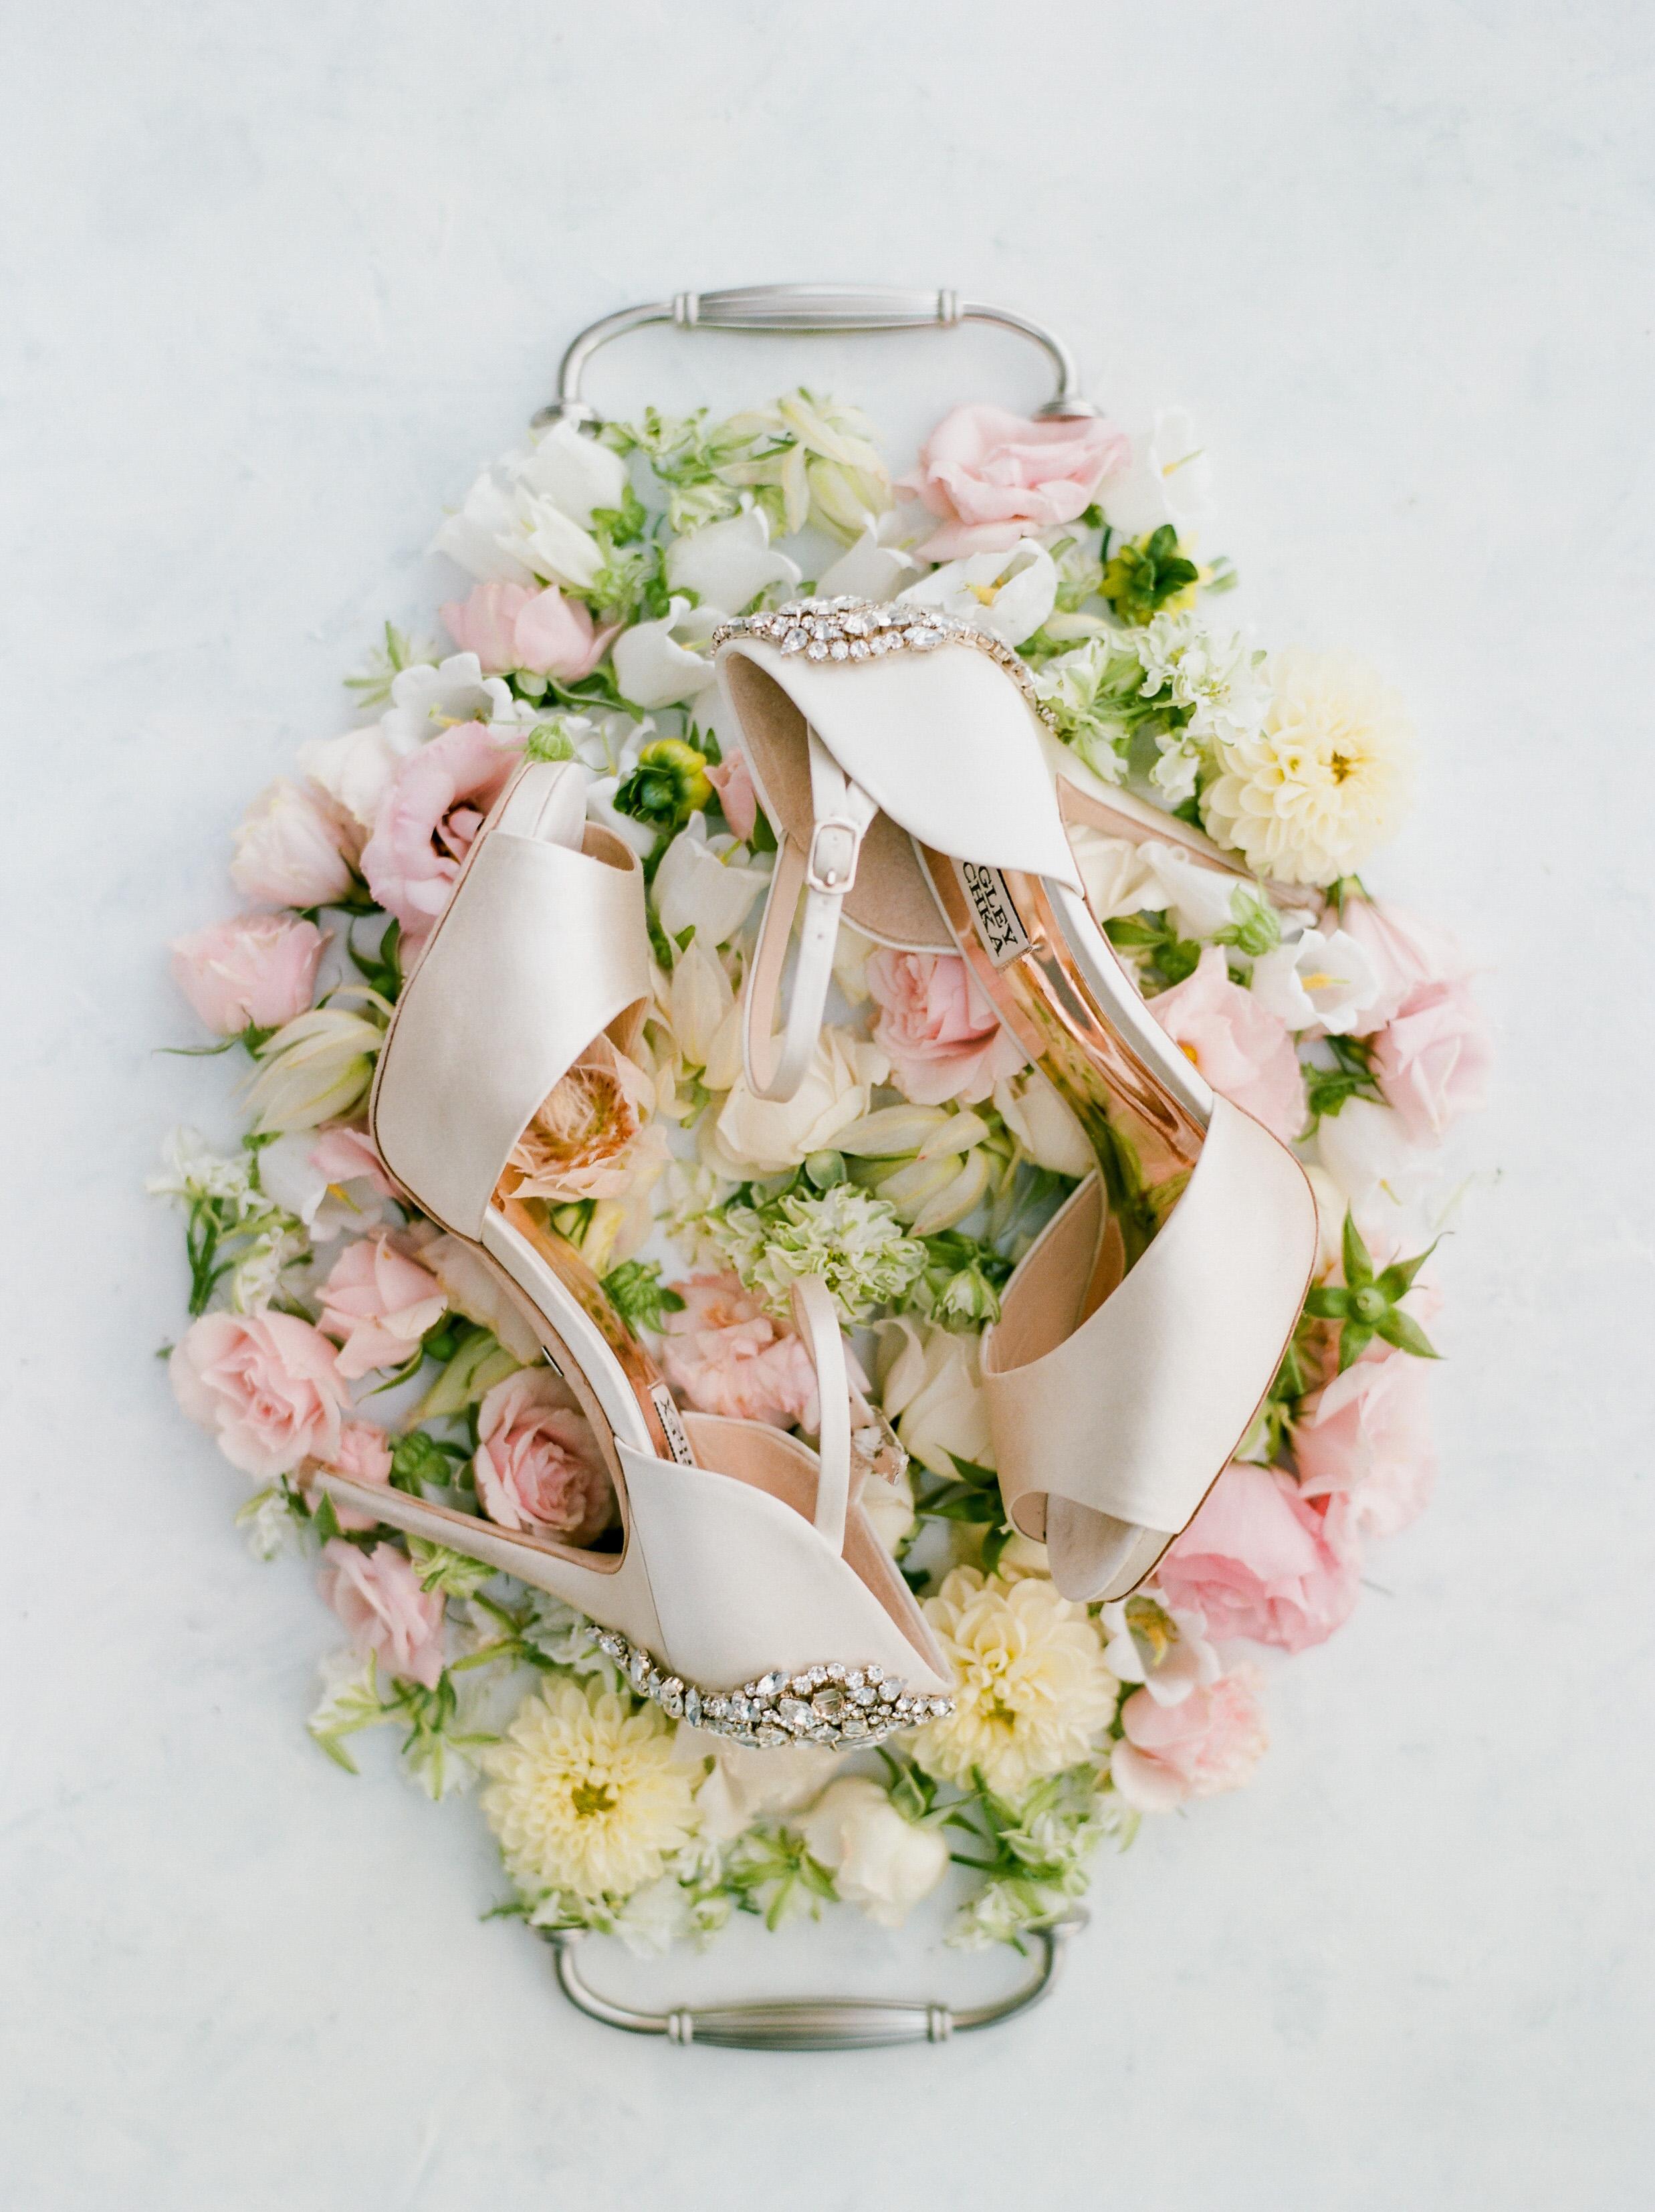 texas wedding badgley mischka shoes flower tray